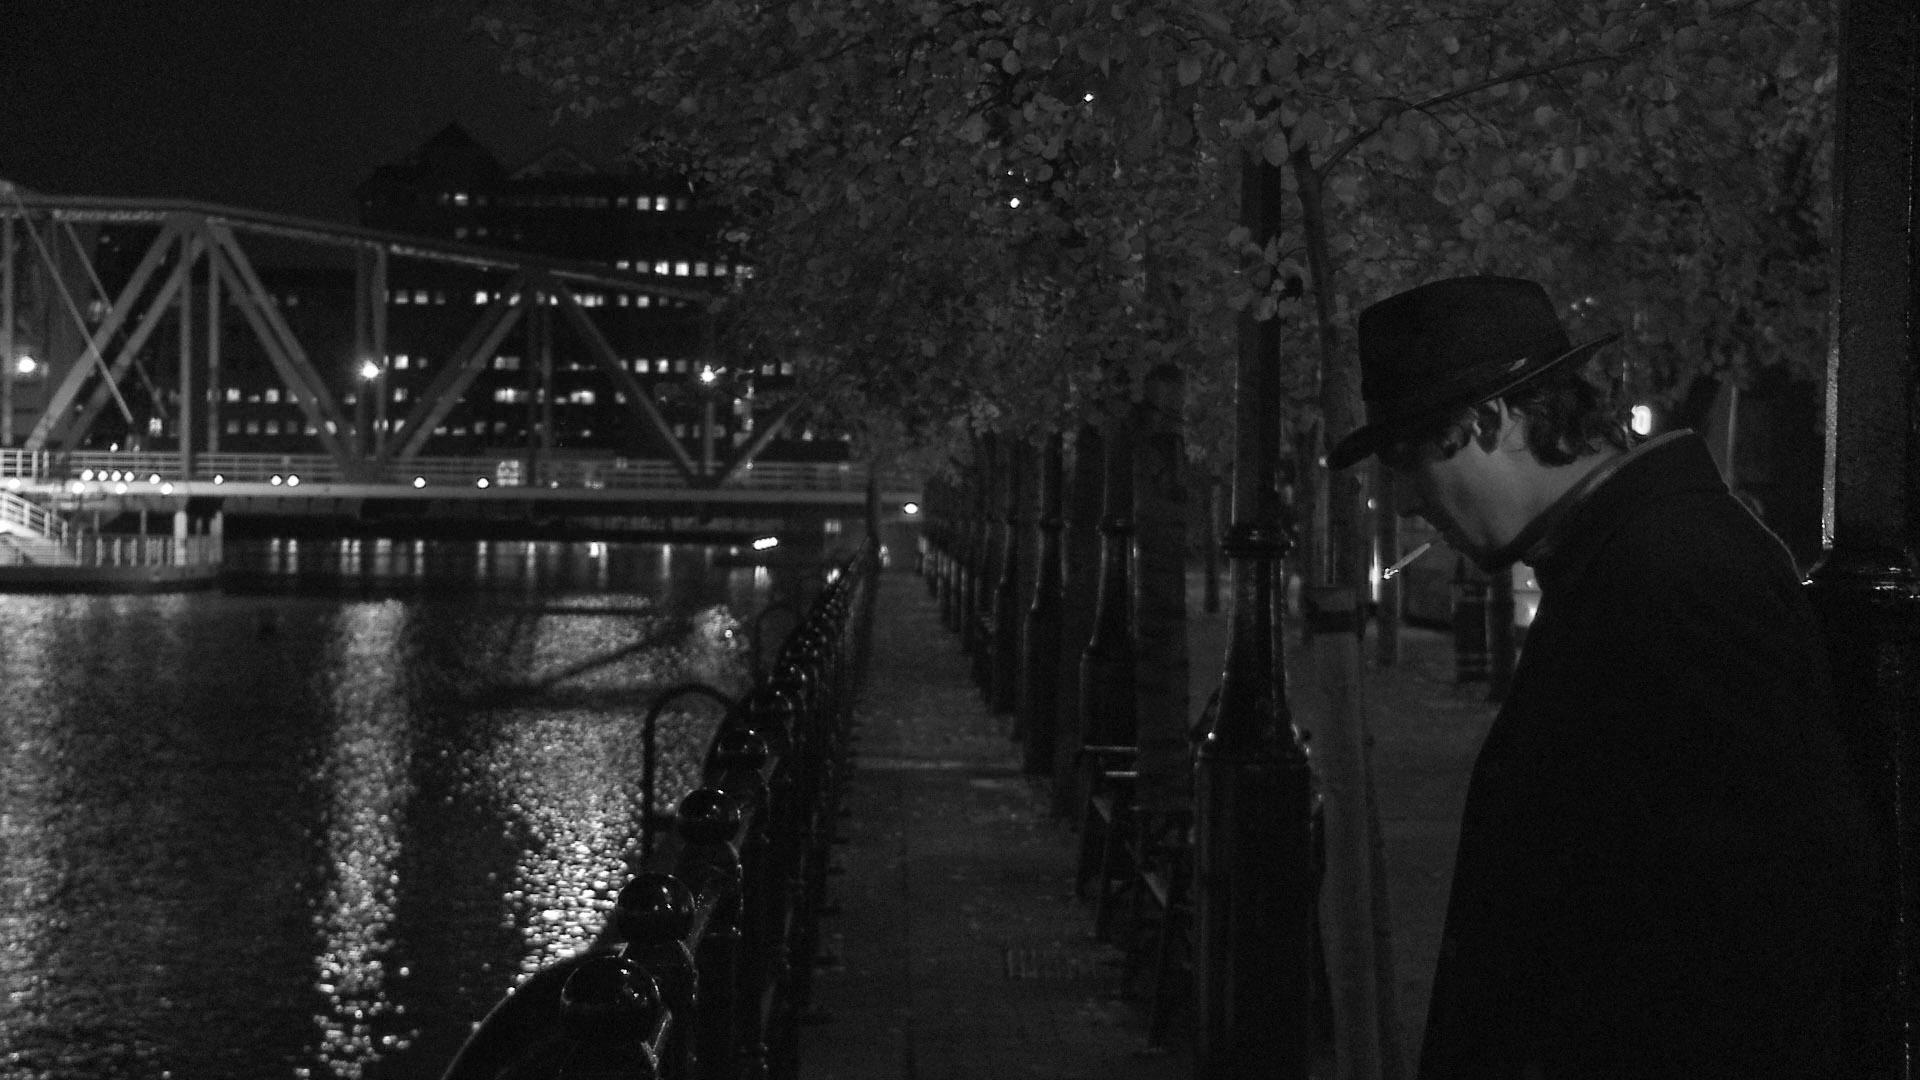 film noir Alicja Socha 1920x1080